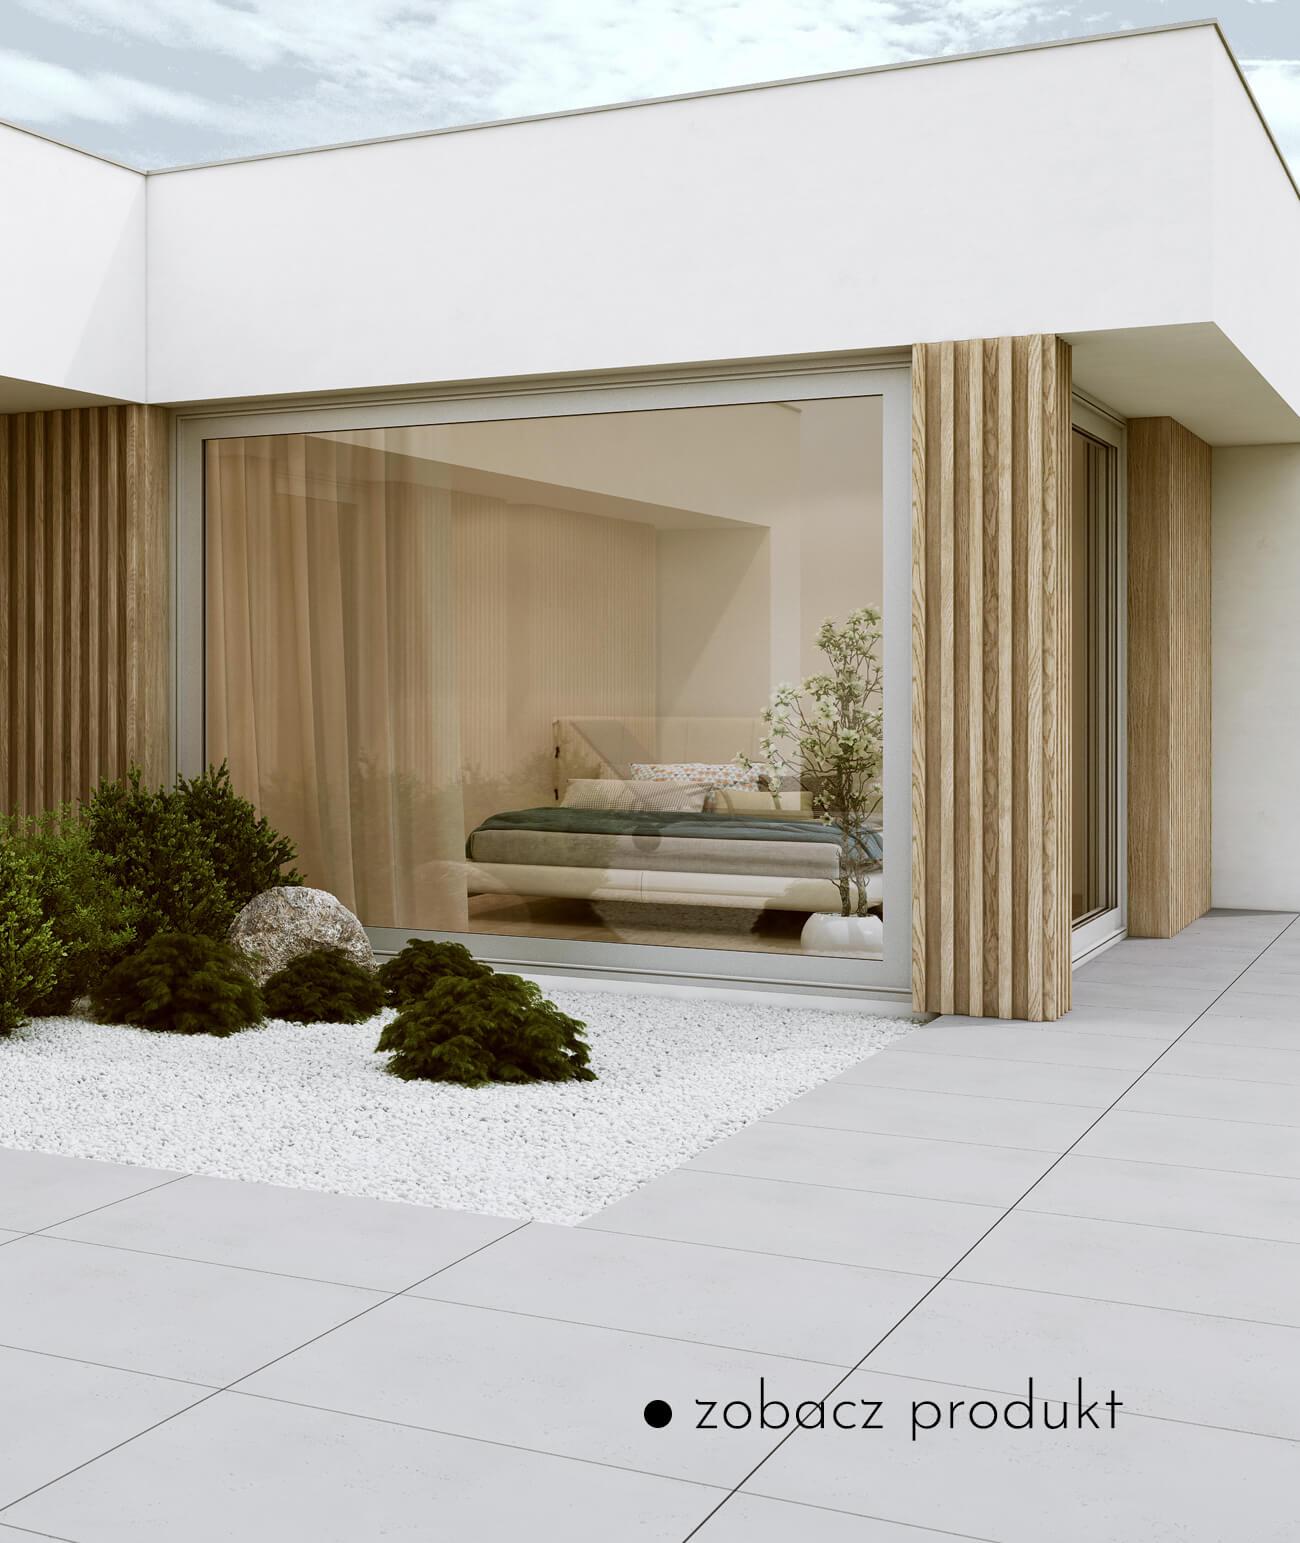 betonowe-plyty-podlogowe-i-tarasowe-beton-architektoniczny_1046-23057-s50-jasny-szary-mysi---betonowa-plyta-podlogowa-i-tarasowa-beton-architektoniczny